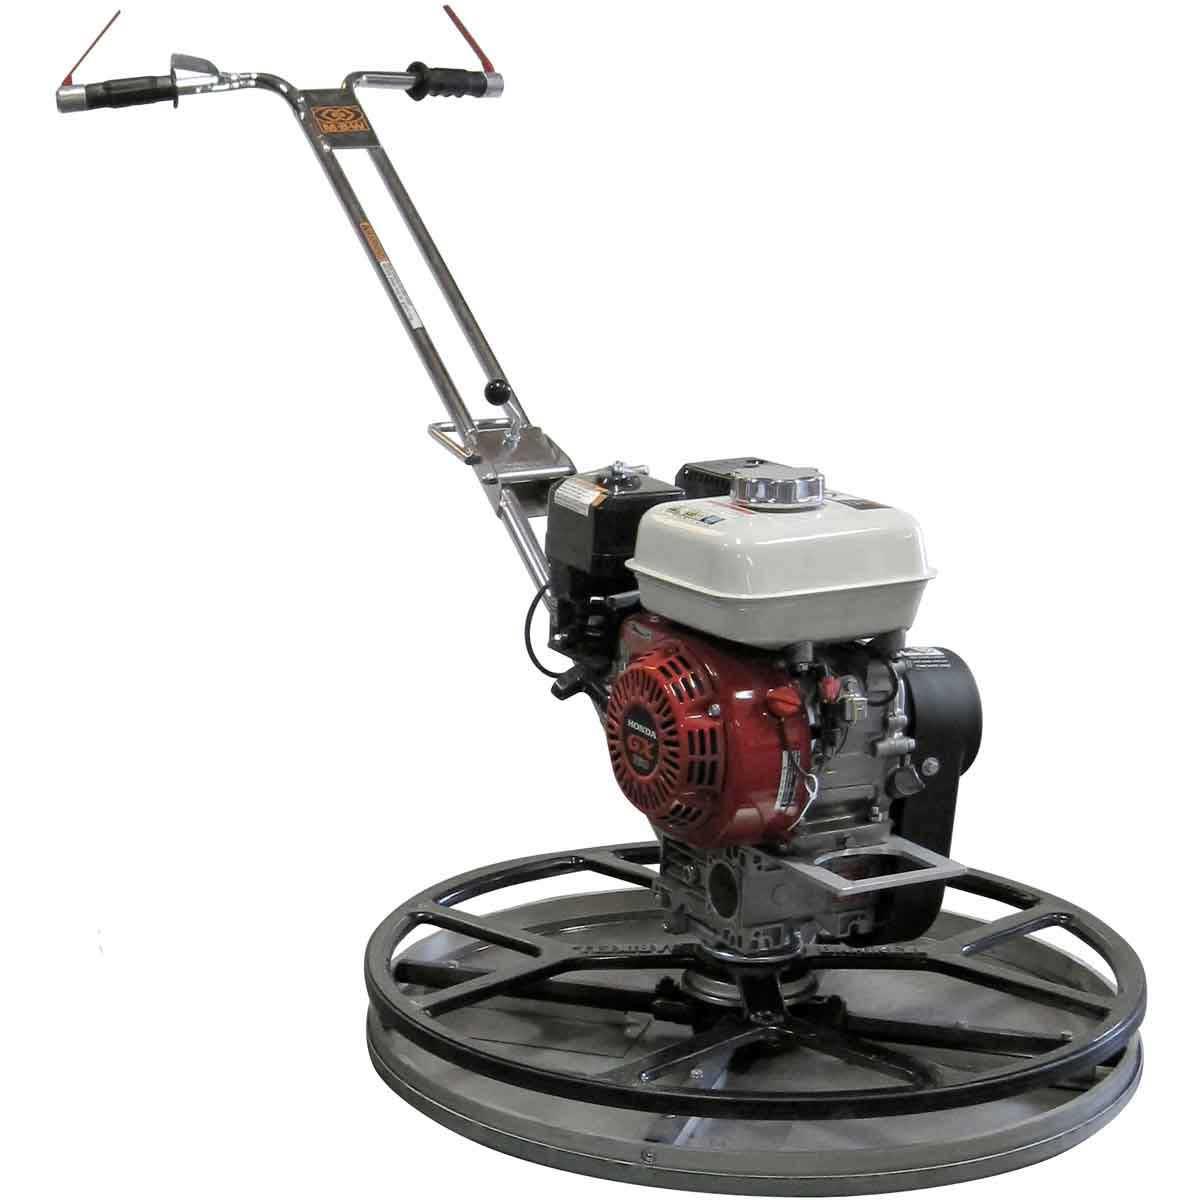 MBW F30 Power Trowel, Honda GX160, Combo Blades